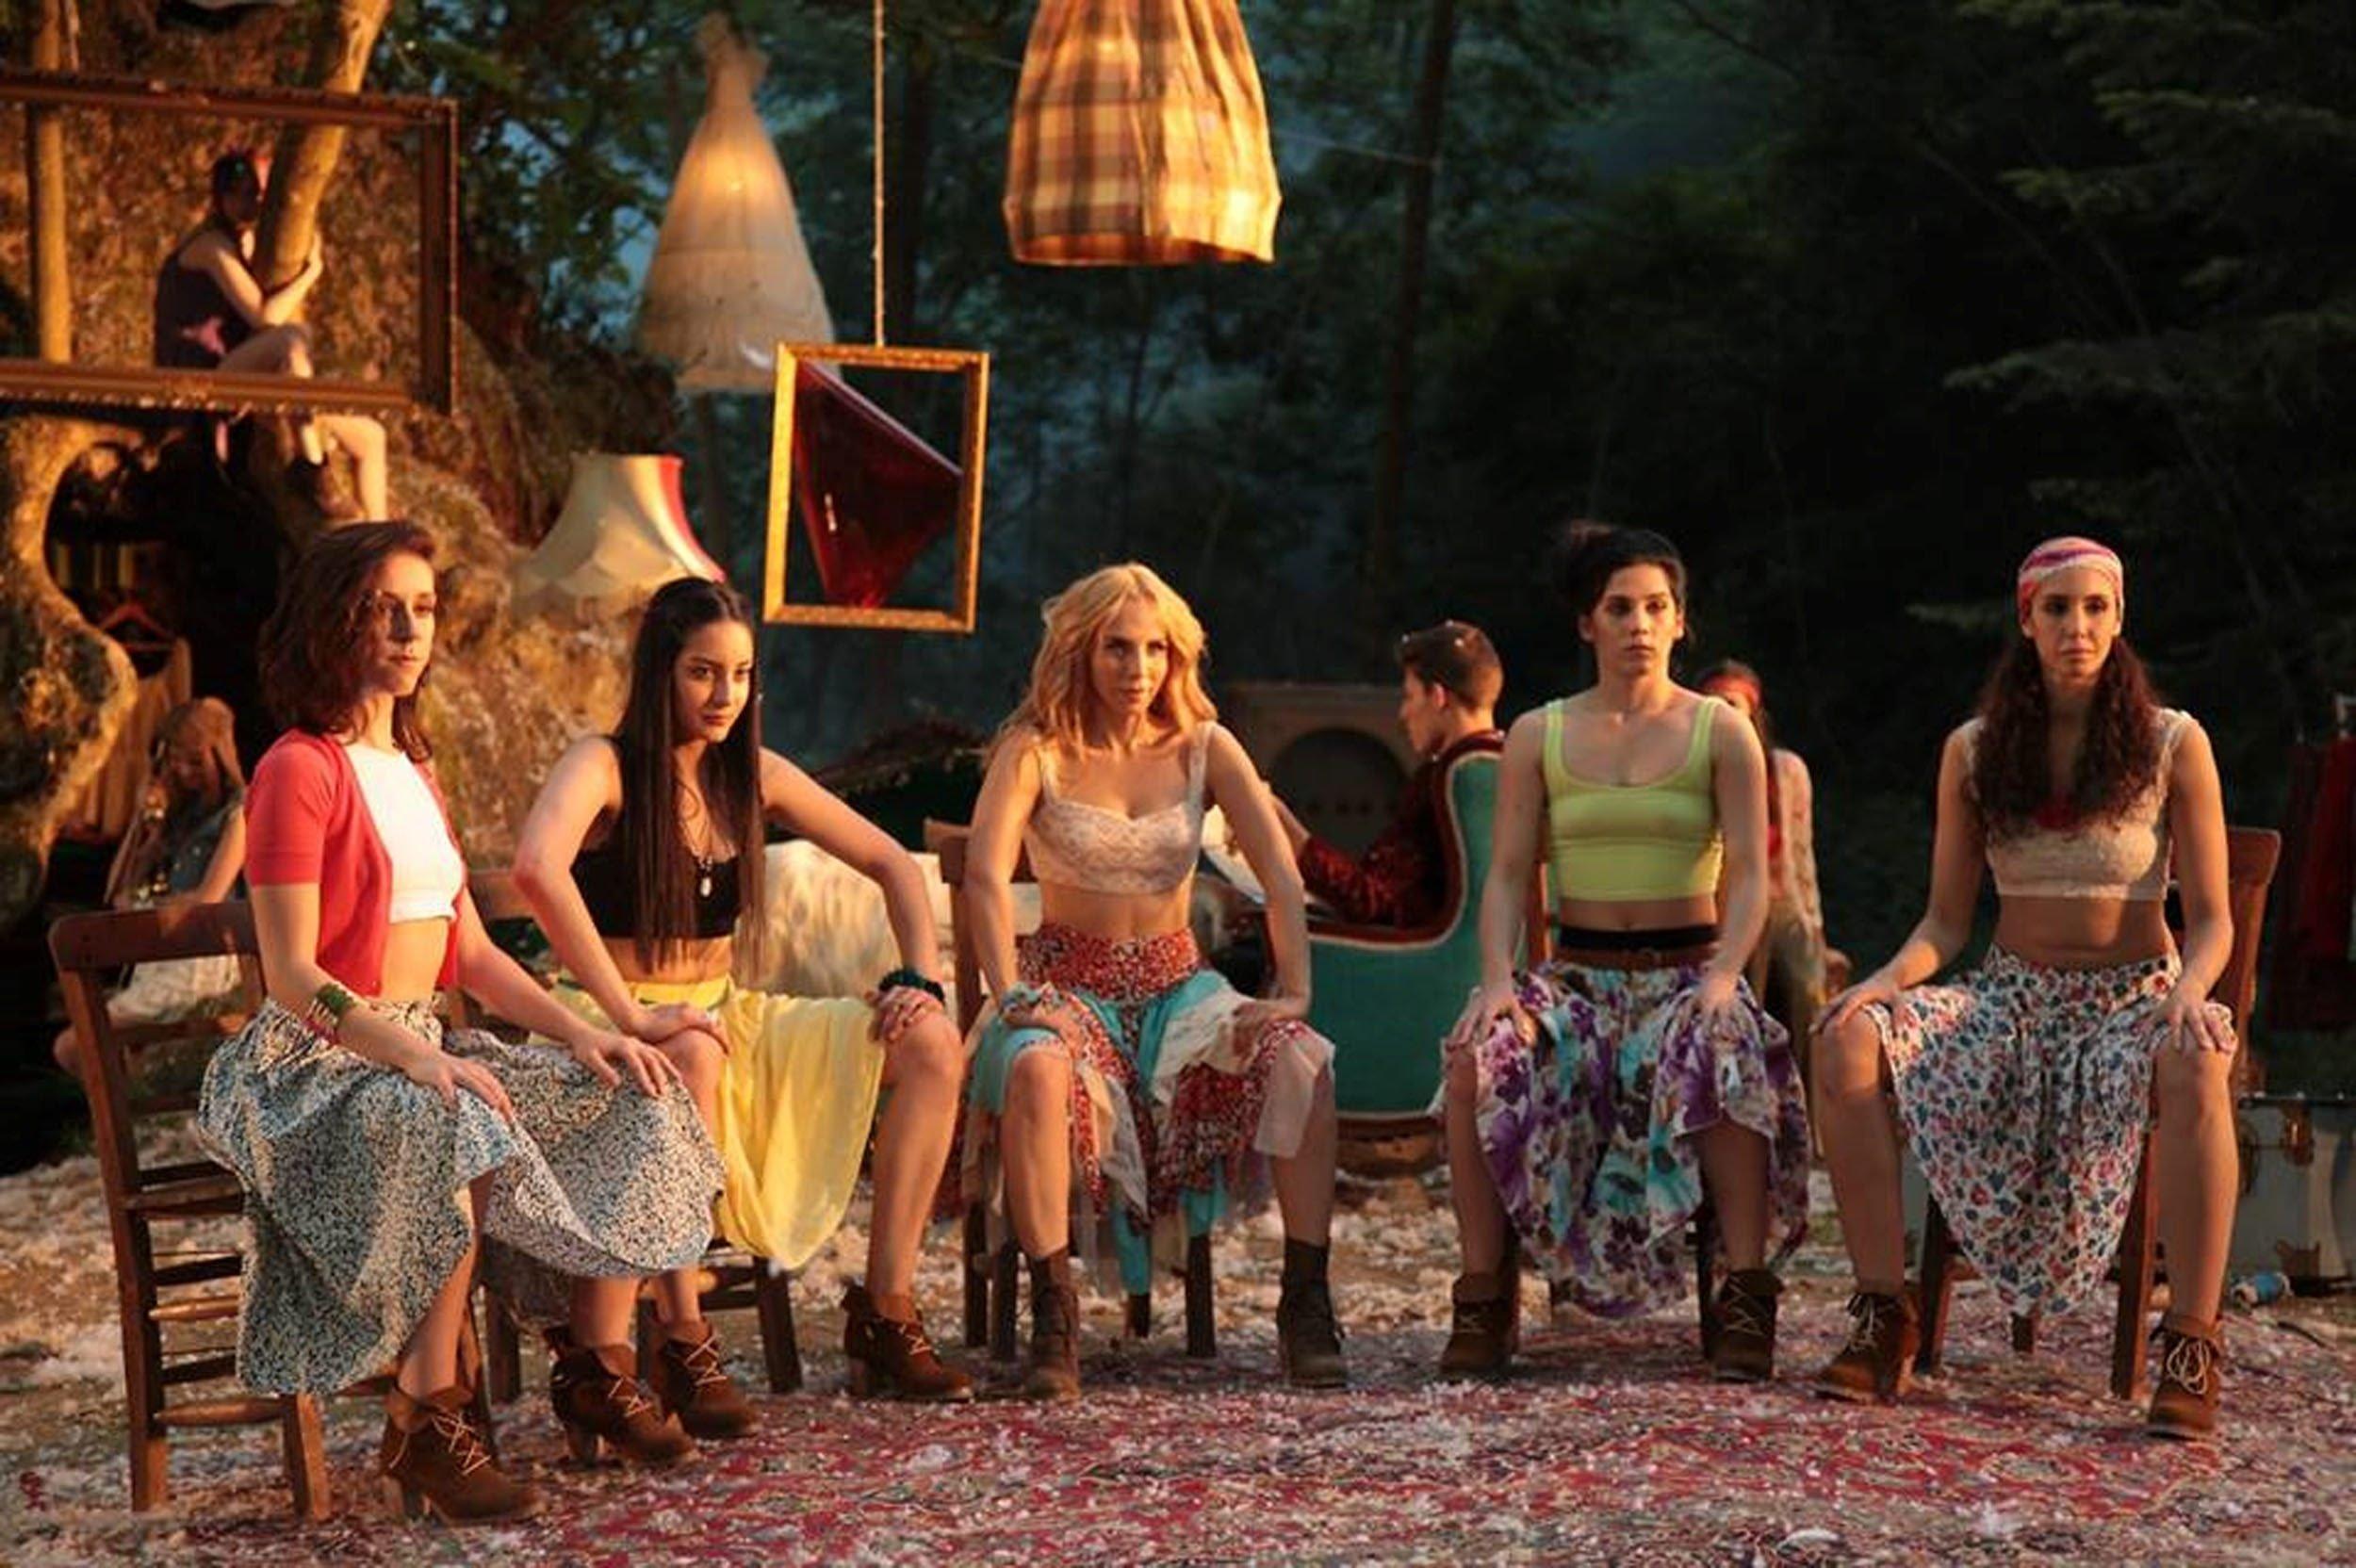 Sertab Erener (C) in a still shot from the clip of her 'Öyle de Güzel Böyle de Güzel' ('He is Beautiful One Way or Another').